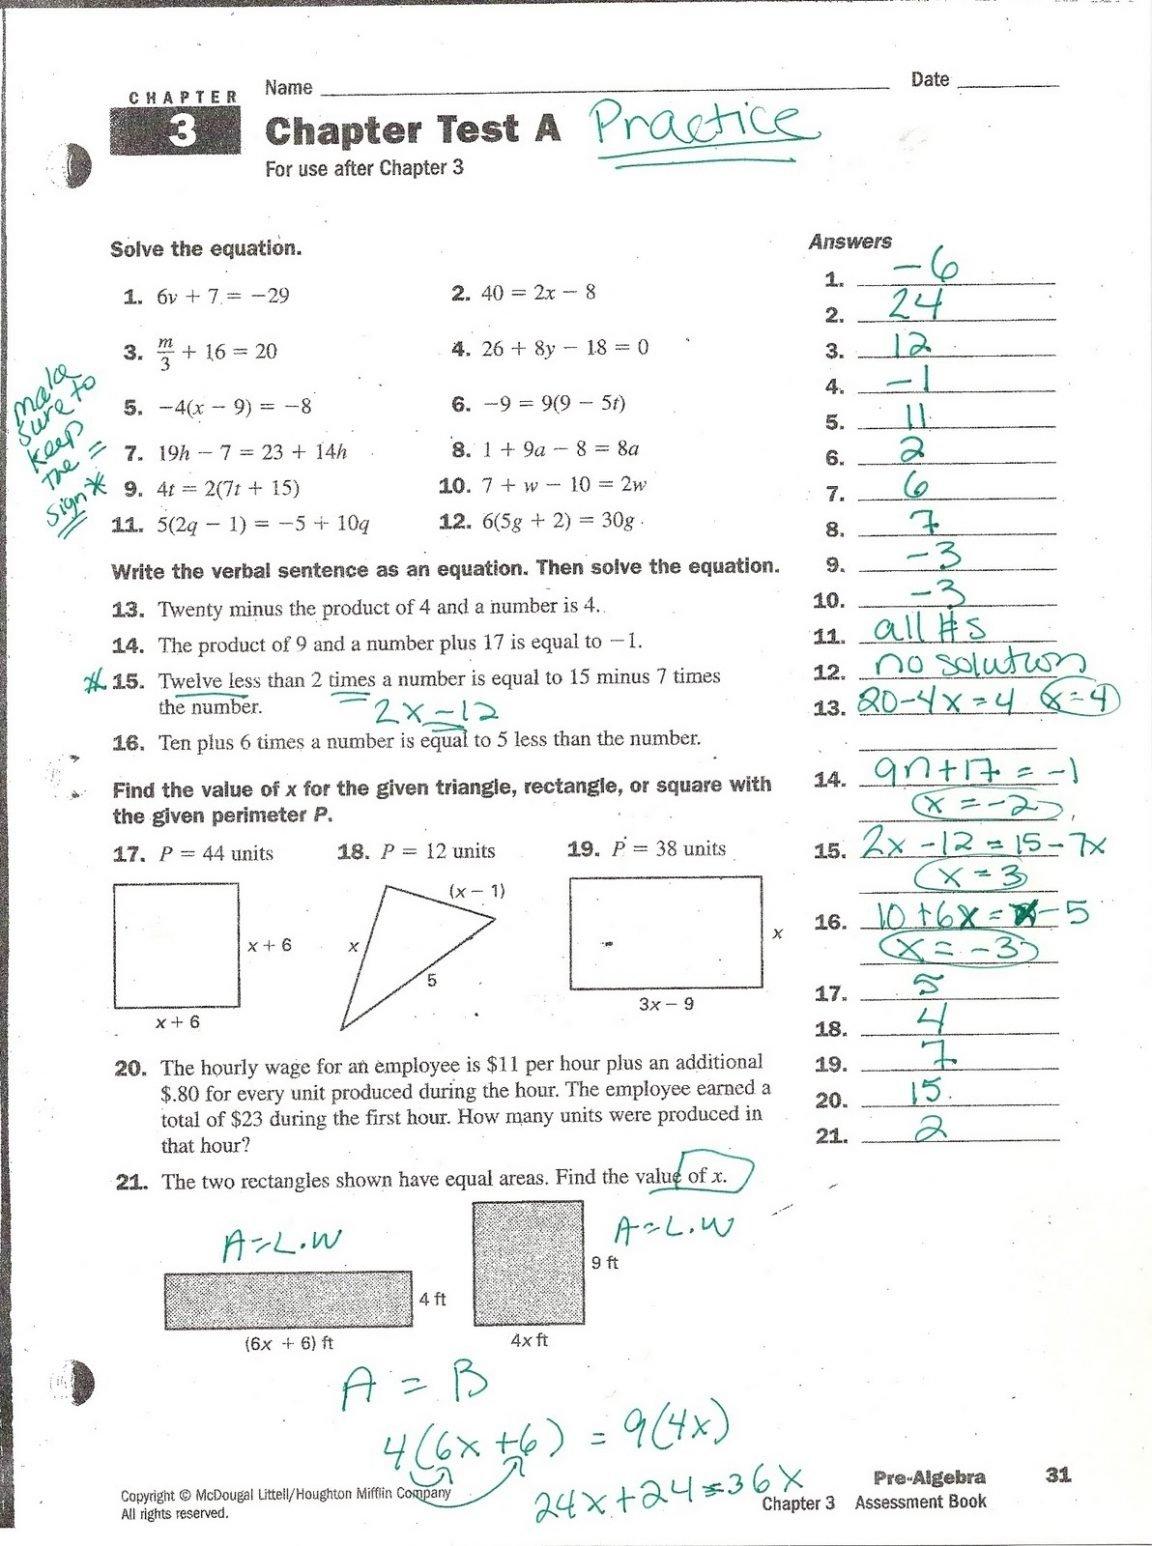 10 Stunning Big Ideas Math Red Book kindergarten big ideas math worksheets arroyo grande high school 1